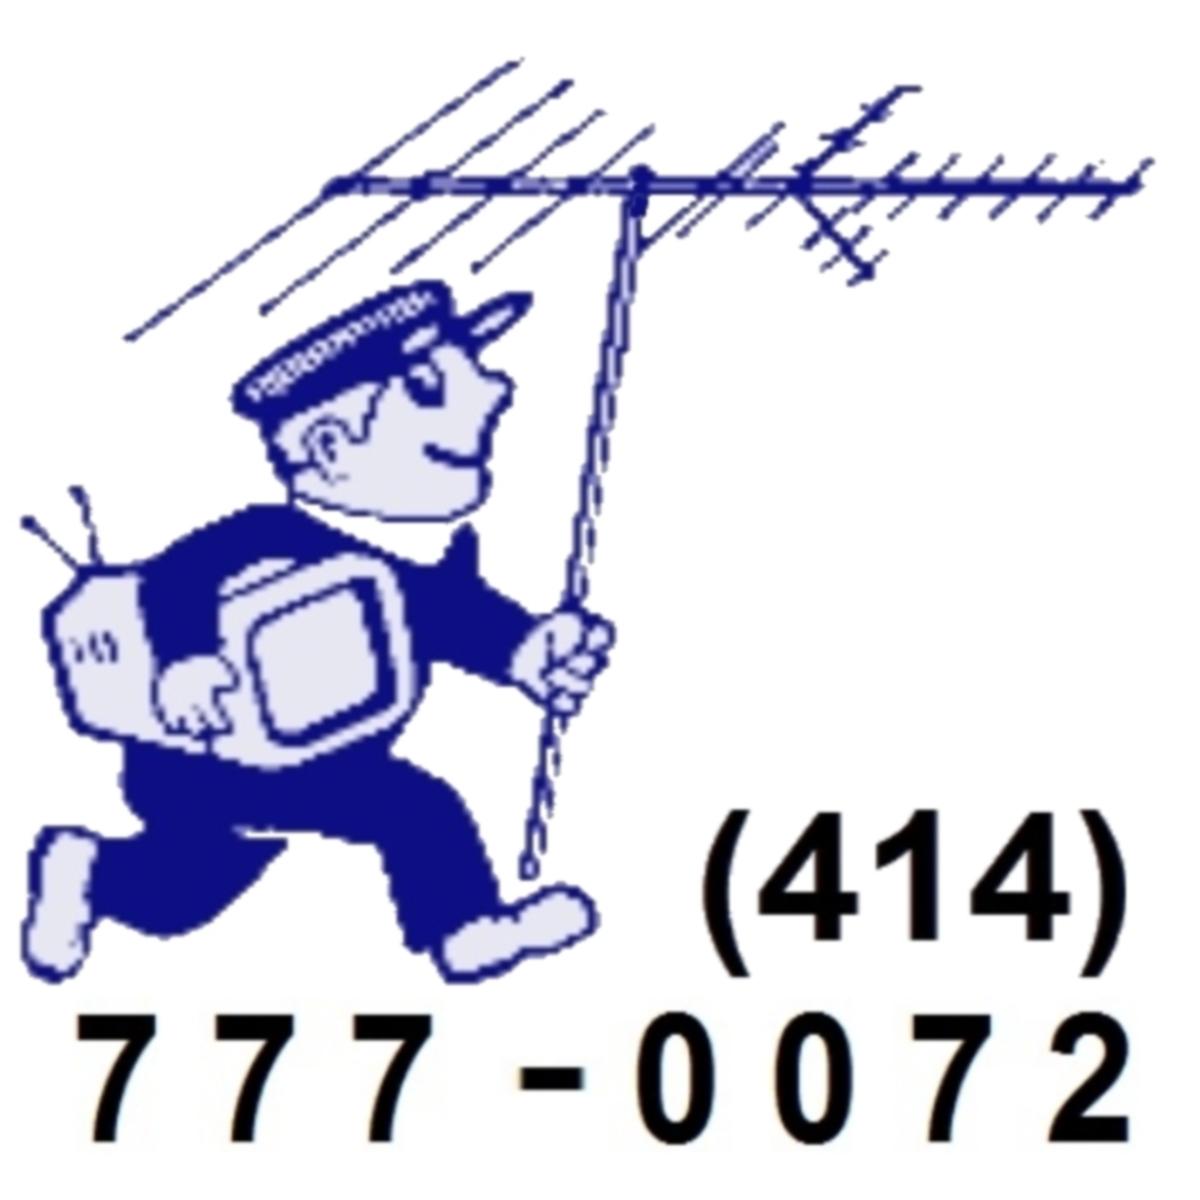 Accurate Appliance & TV Repair (414) 777-0072